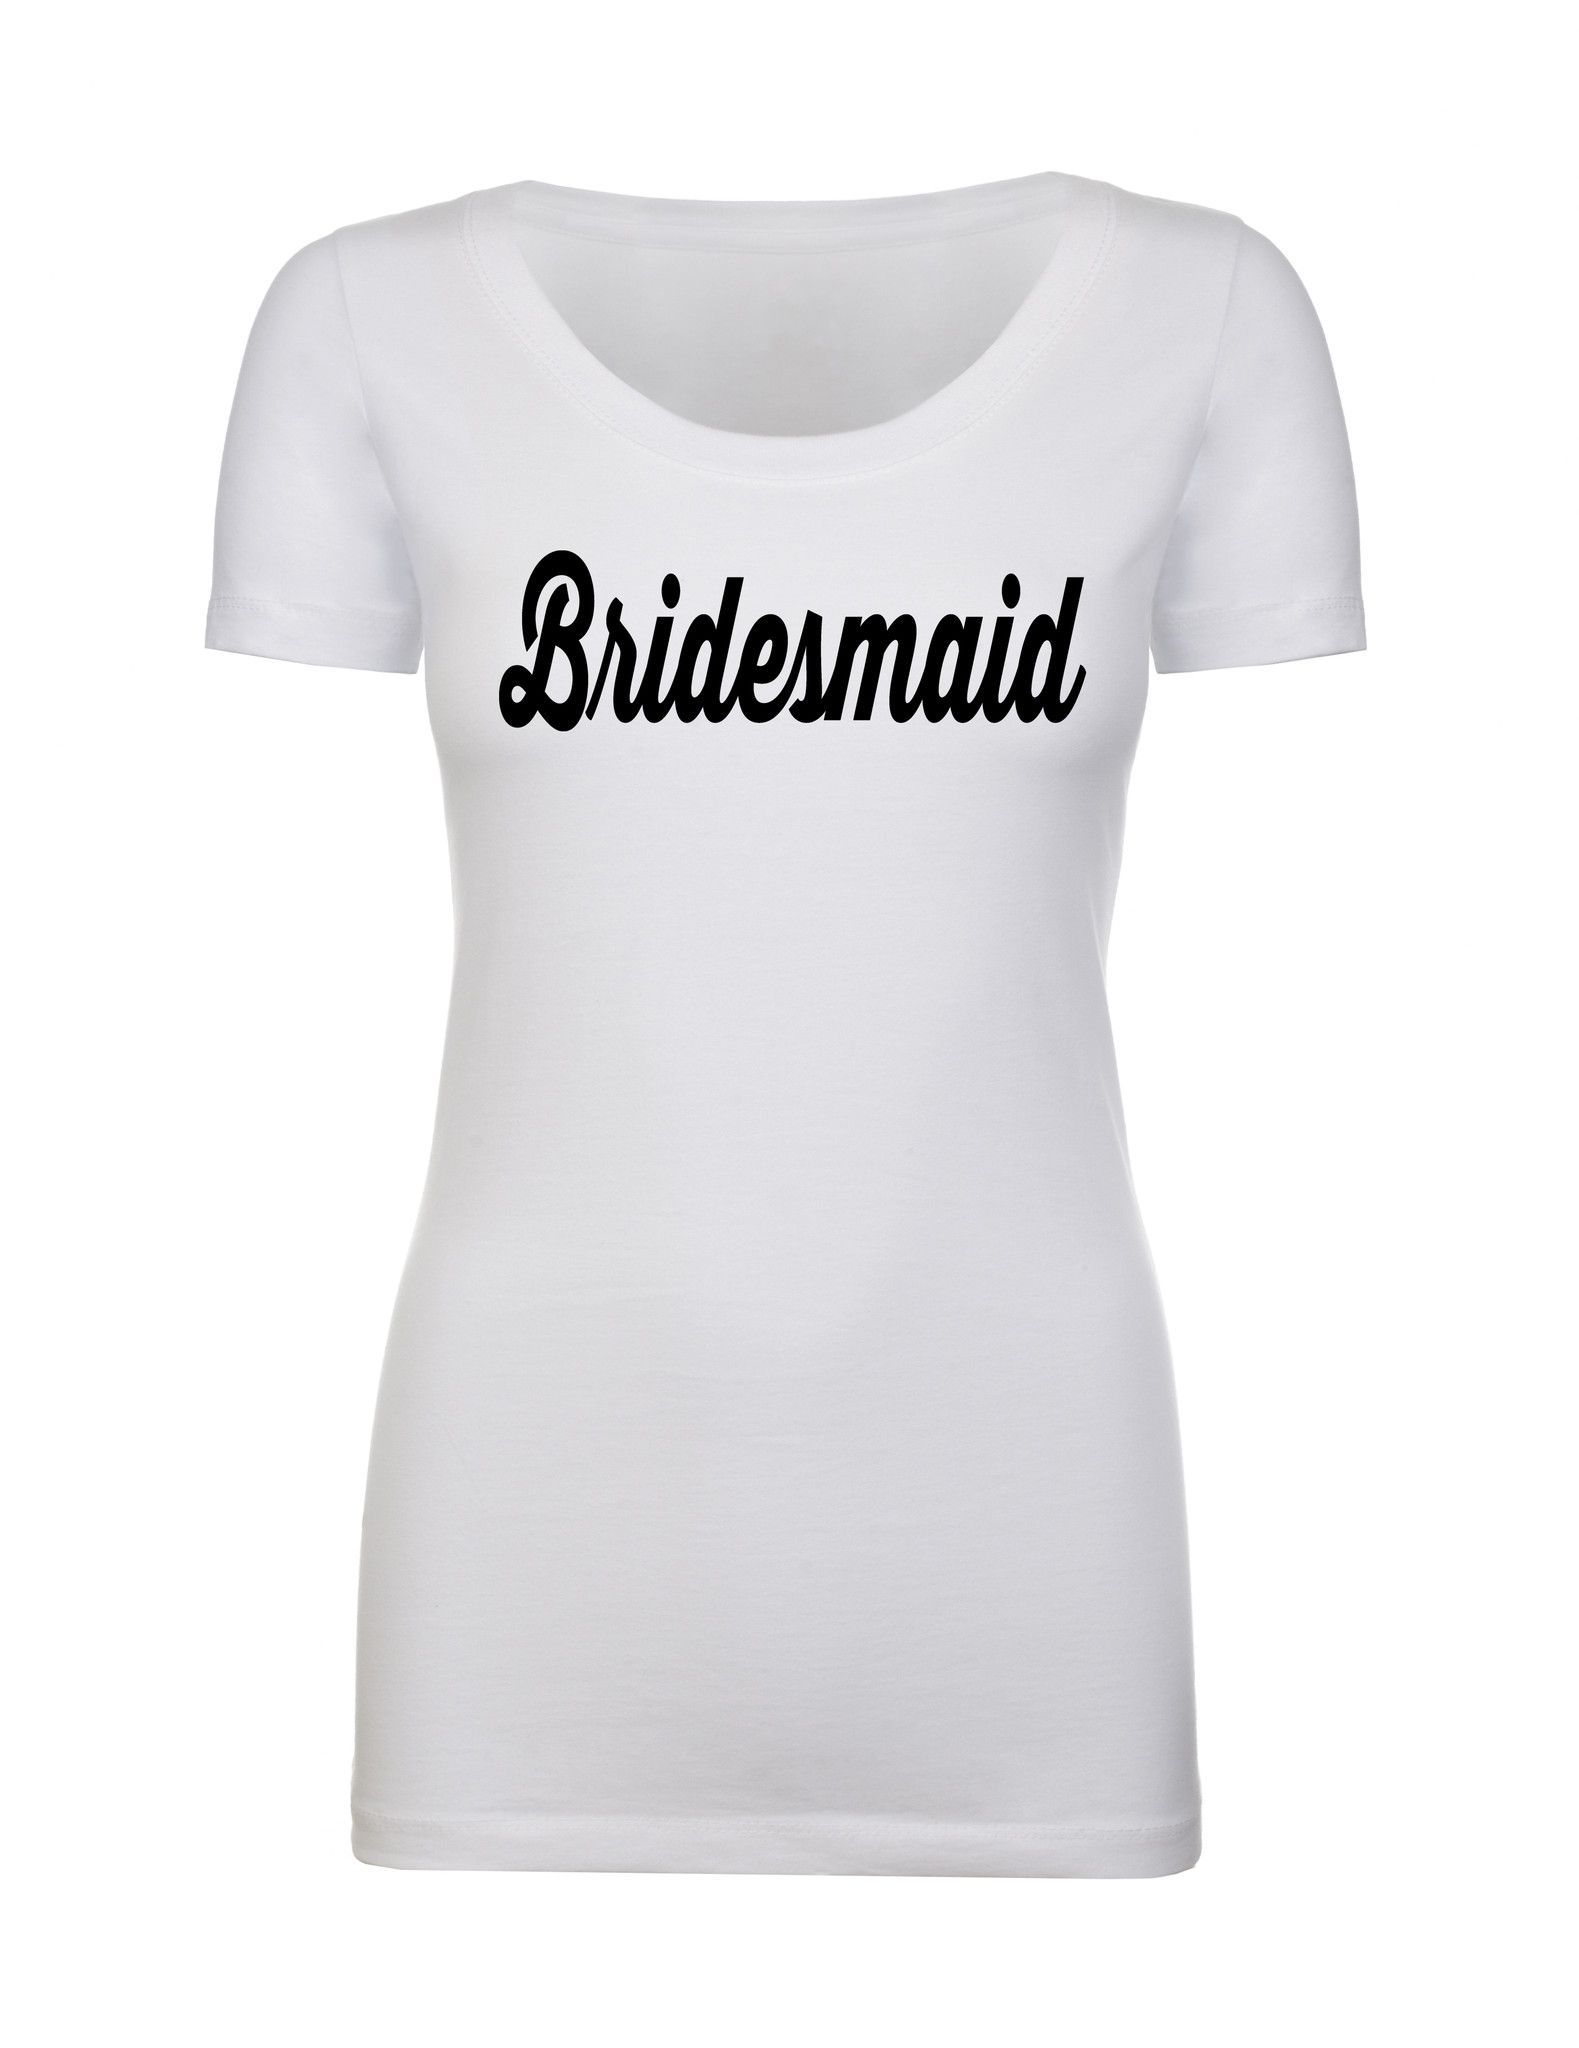 Bridesmaid - Modern